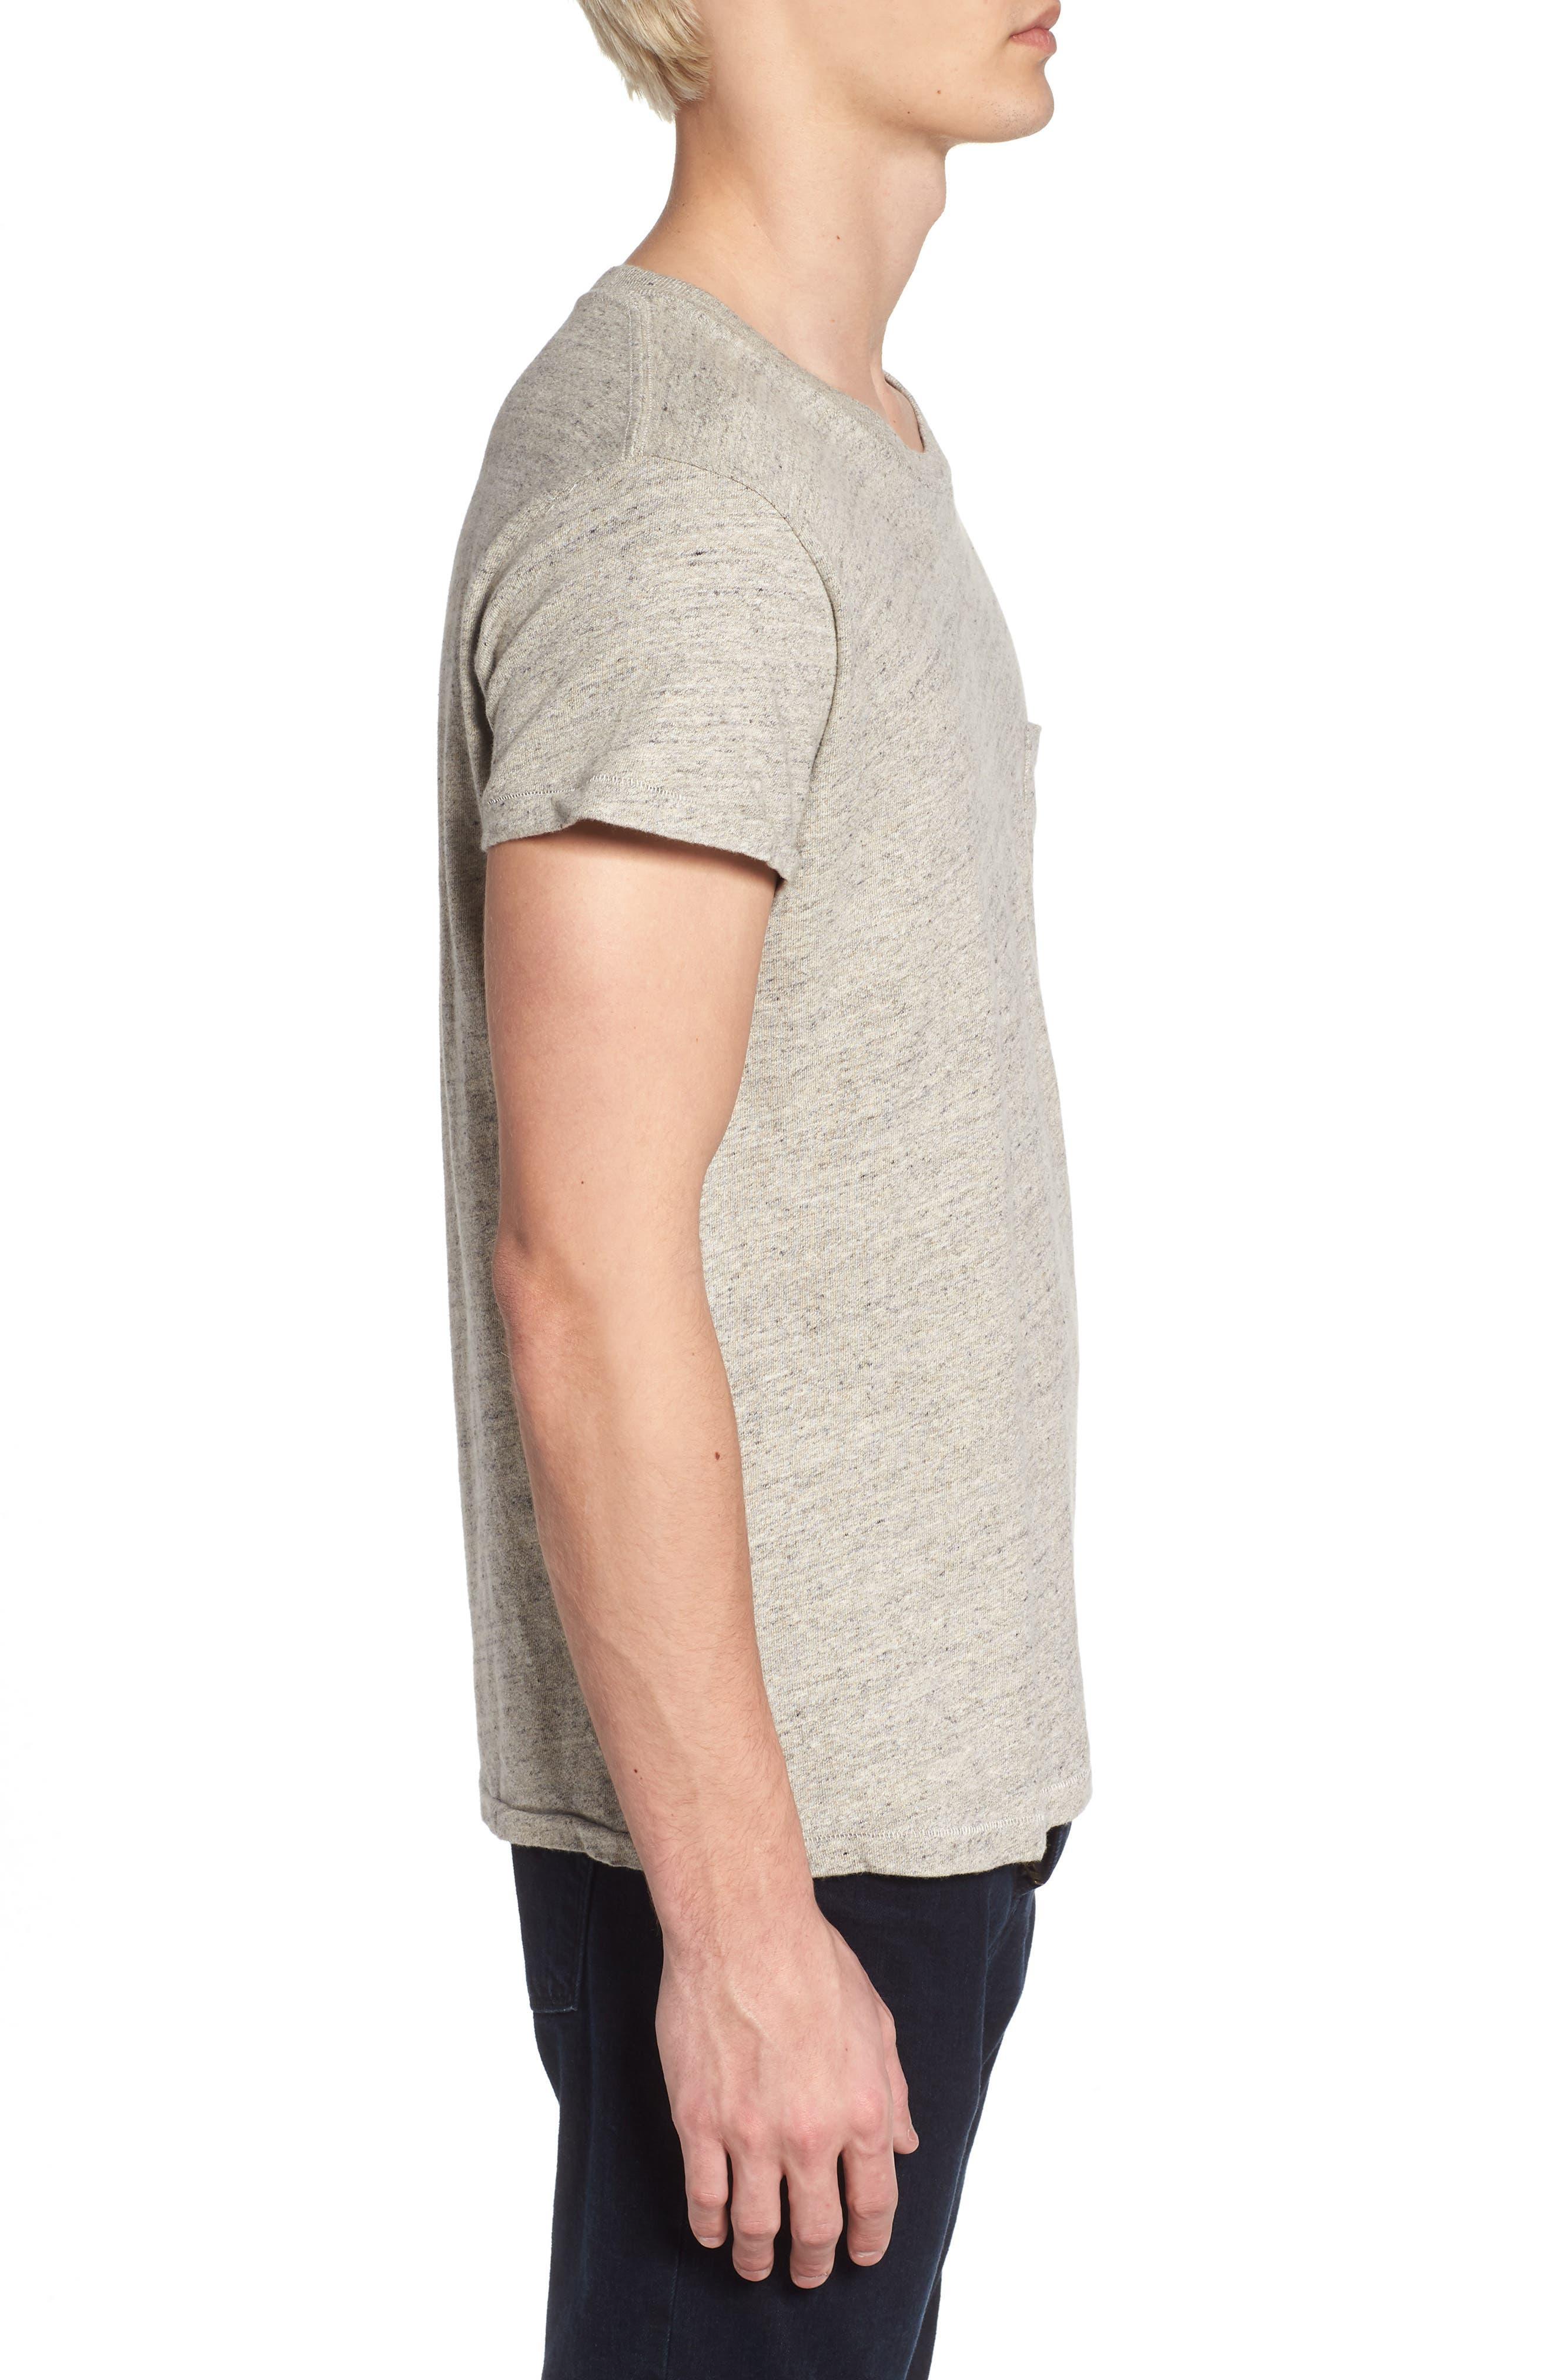 Levi's Vintage Clothing 1950s Sportswear Pocket T-Shirt,                             Alternate thumbnail 3, color,                             Grey